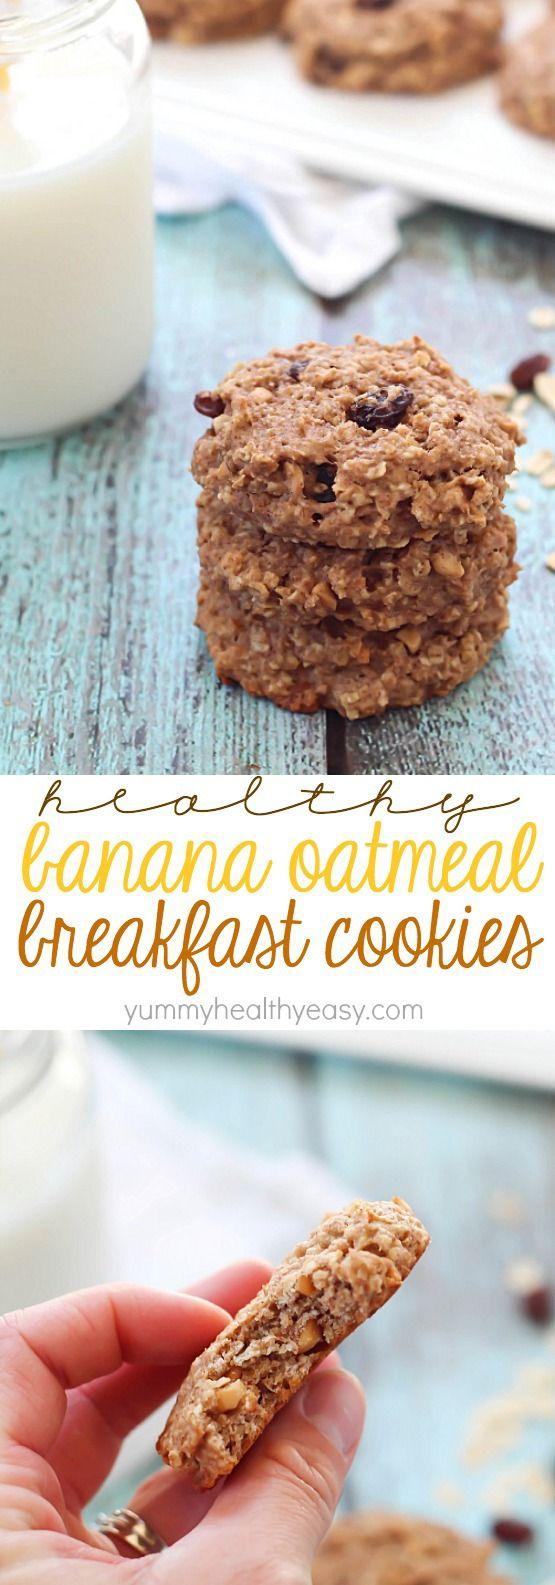 Healthy Banana Oatmeal Breakfast Cookies! Easy Breakfast Recipe for Fall!